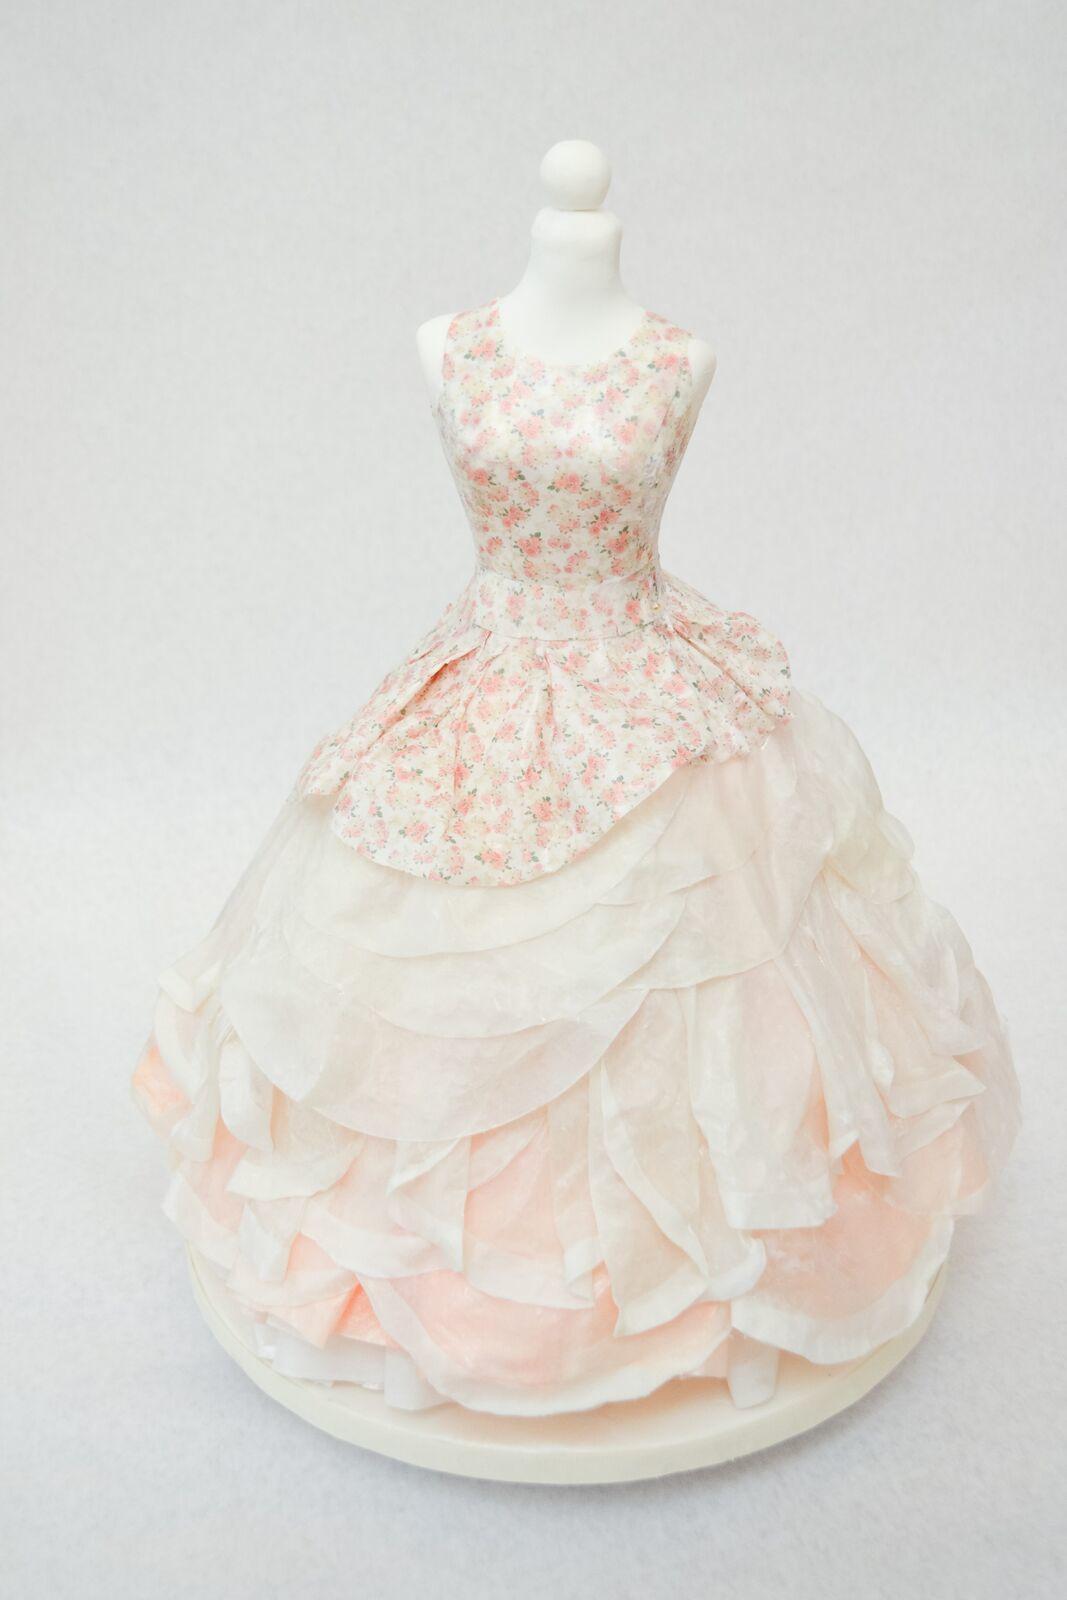 Brides-Around-the-World-Jennifer-Kennedy.jpeg#asset:13755